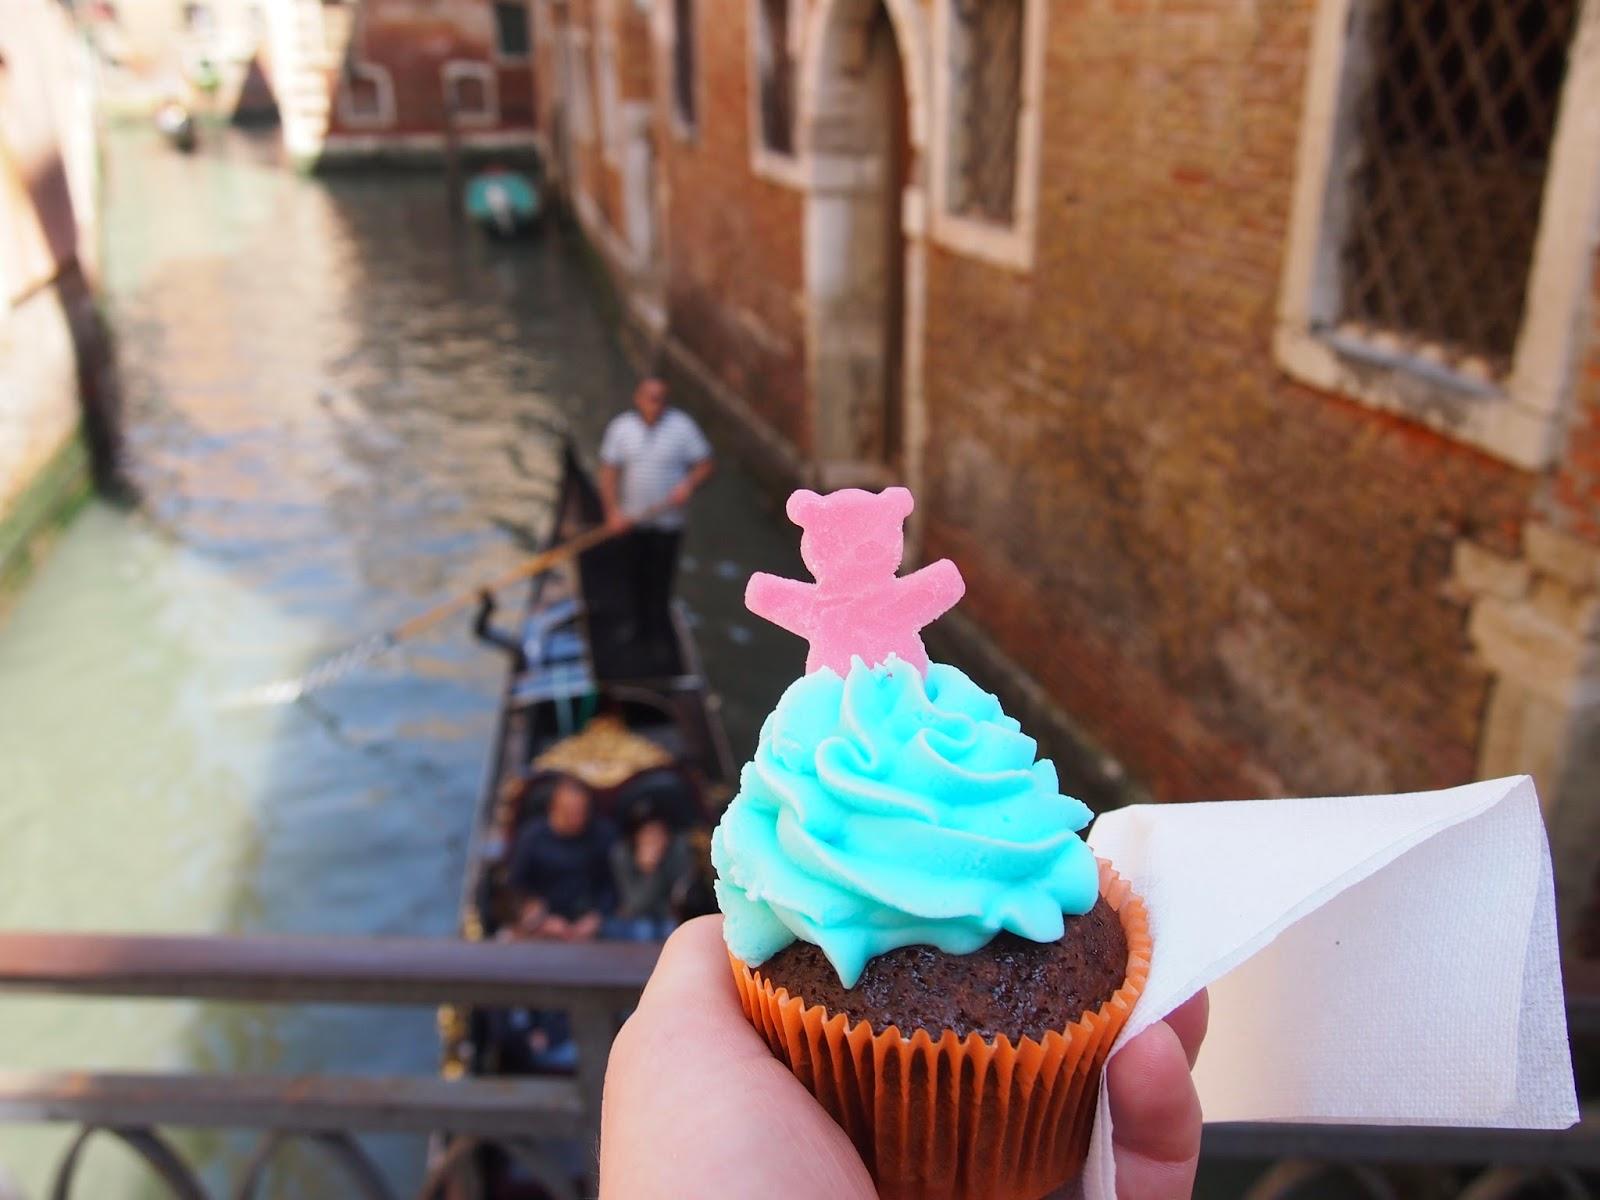 Cupcake and gondola in Venice